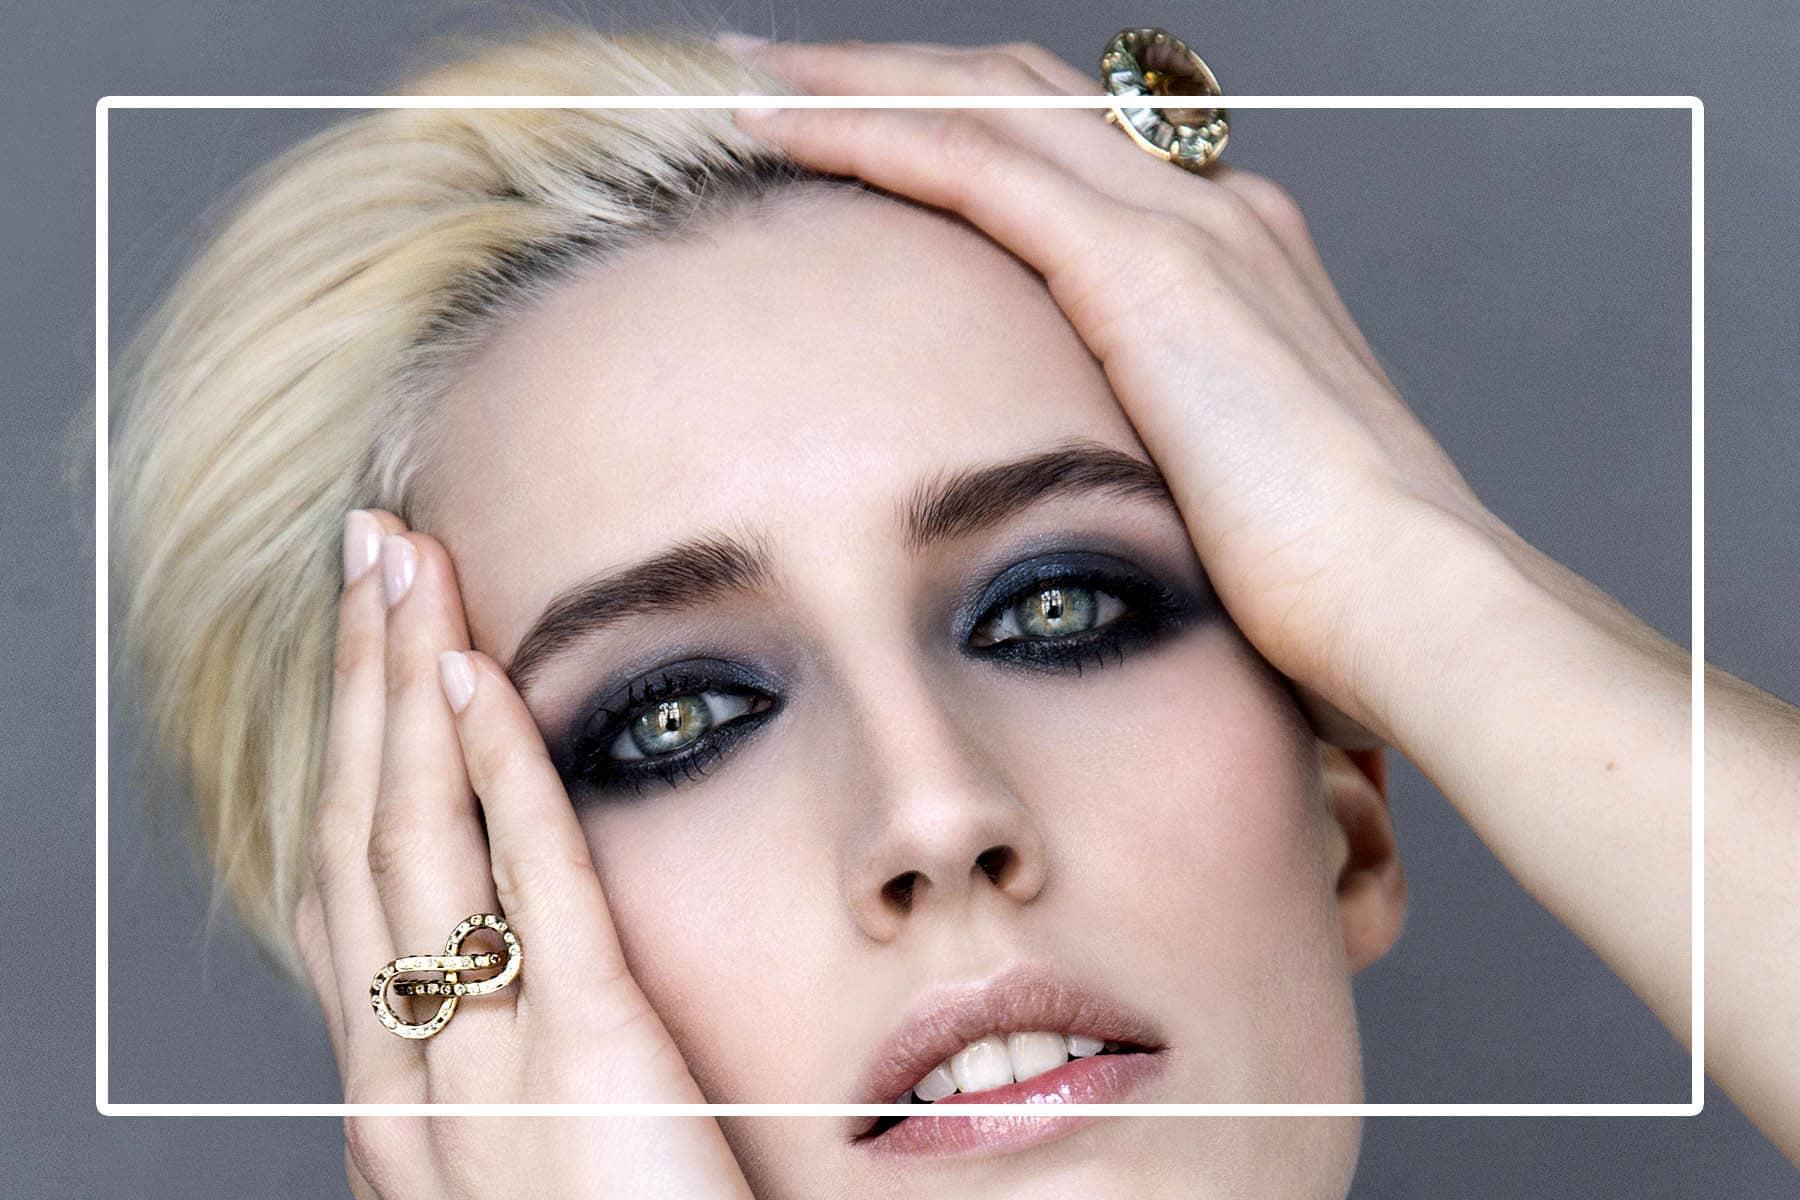 OuiPlease OuiBlog French luxury jewelry brand Géraldine valluet